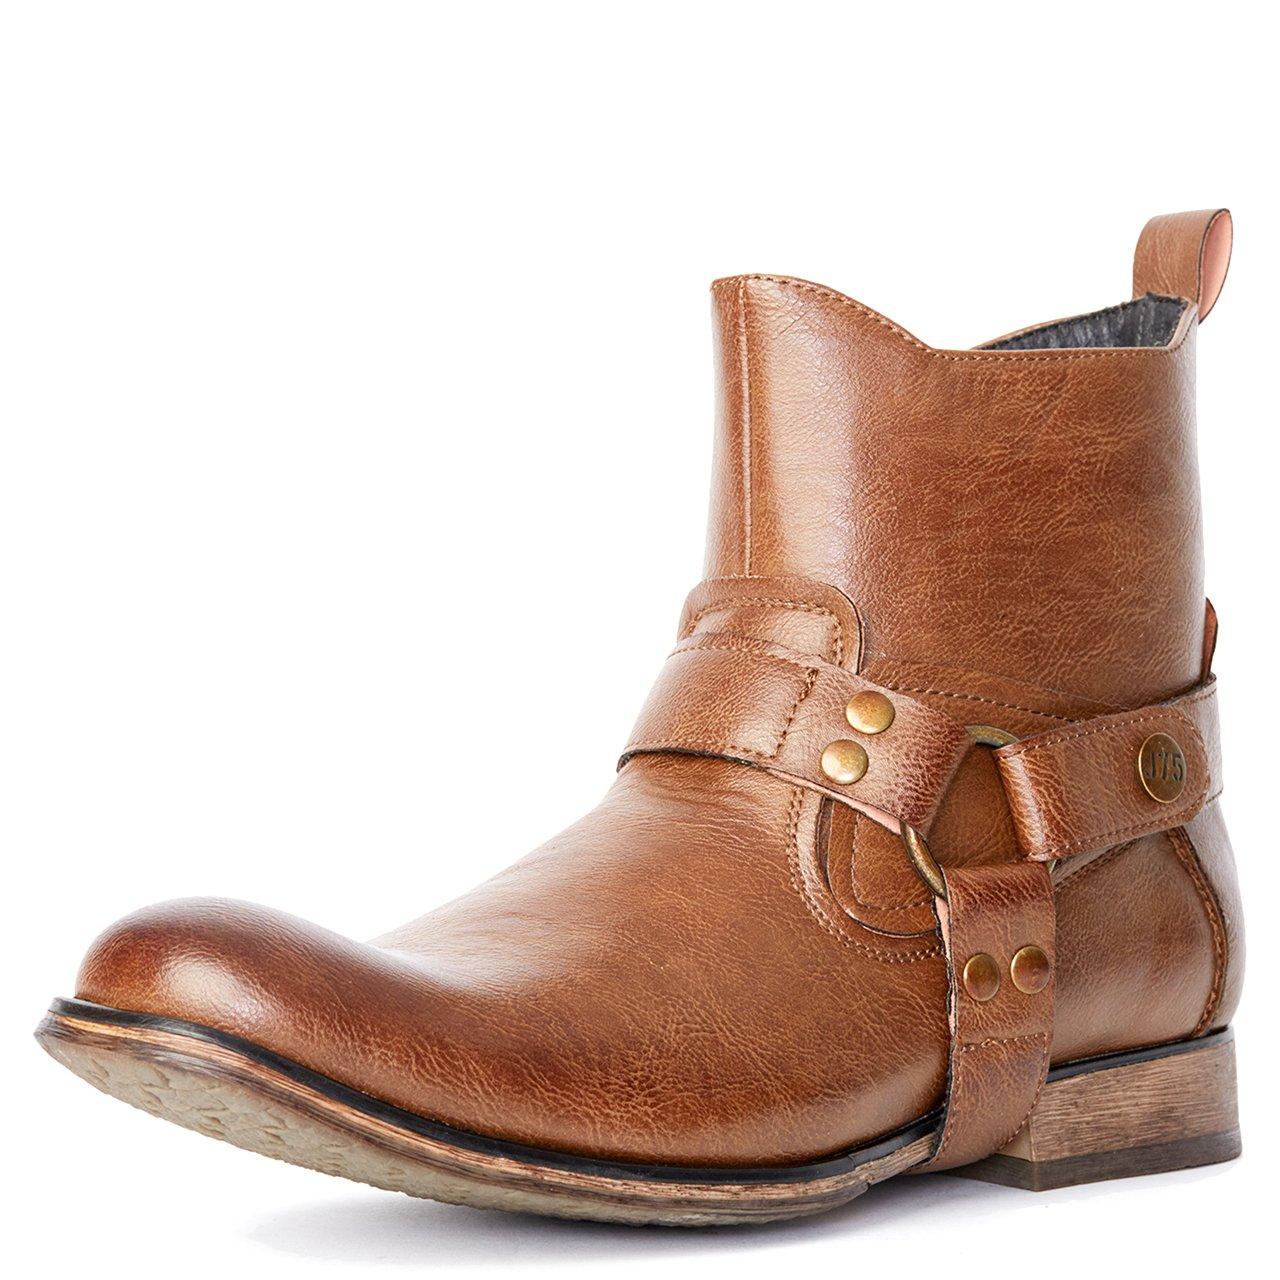 Jump J75 by Men's Wild X Western Boot Tan Pebble 9 D US